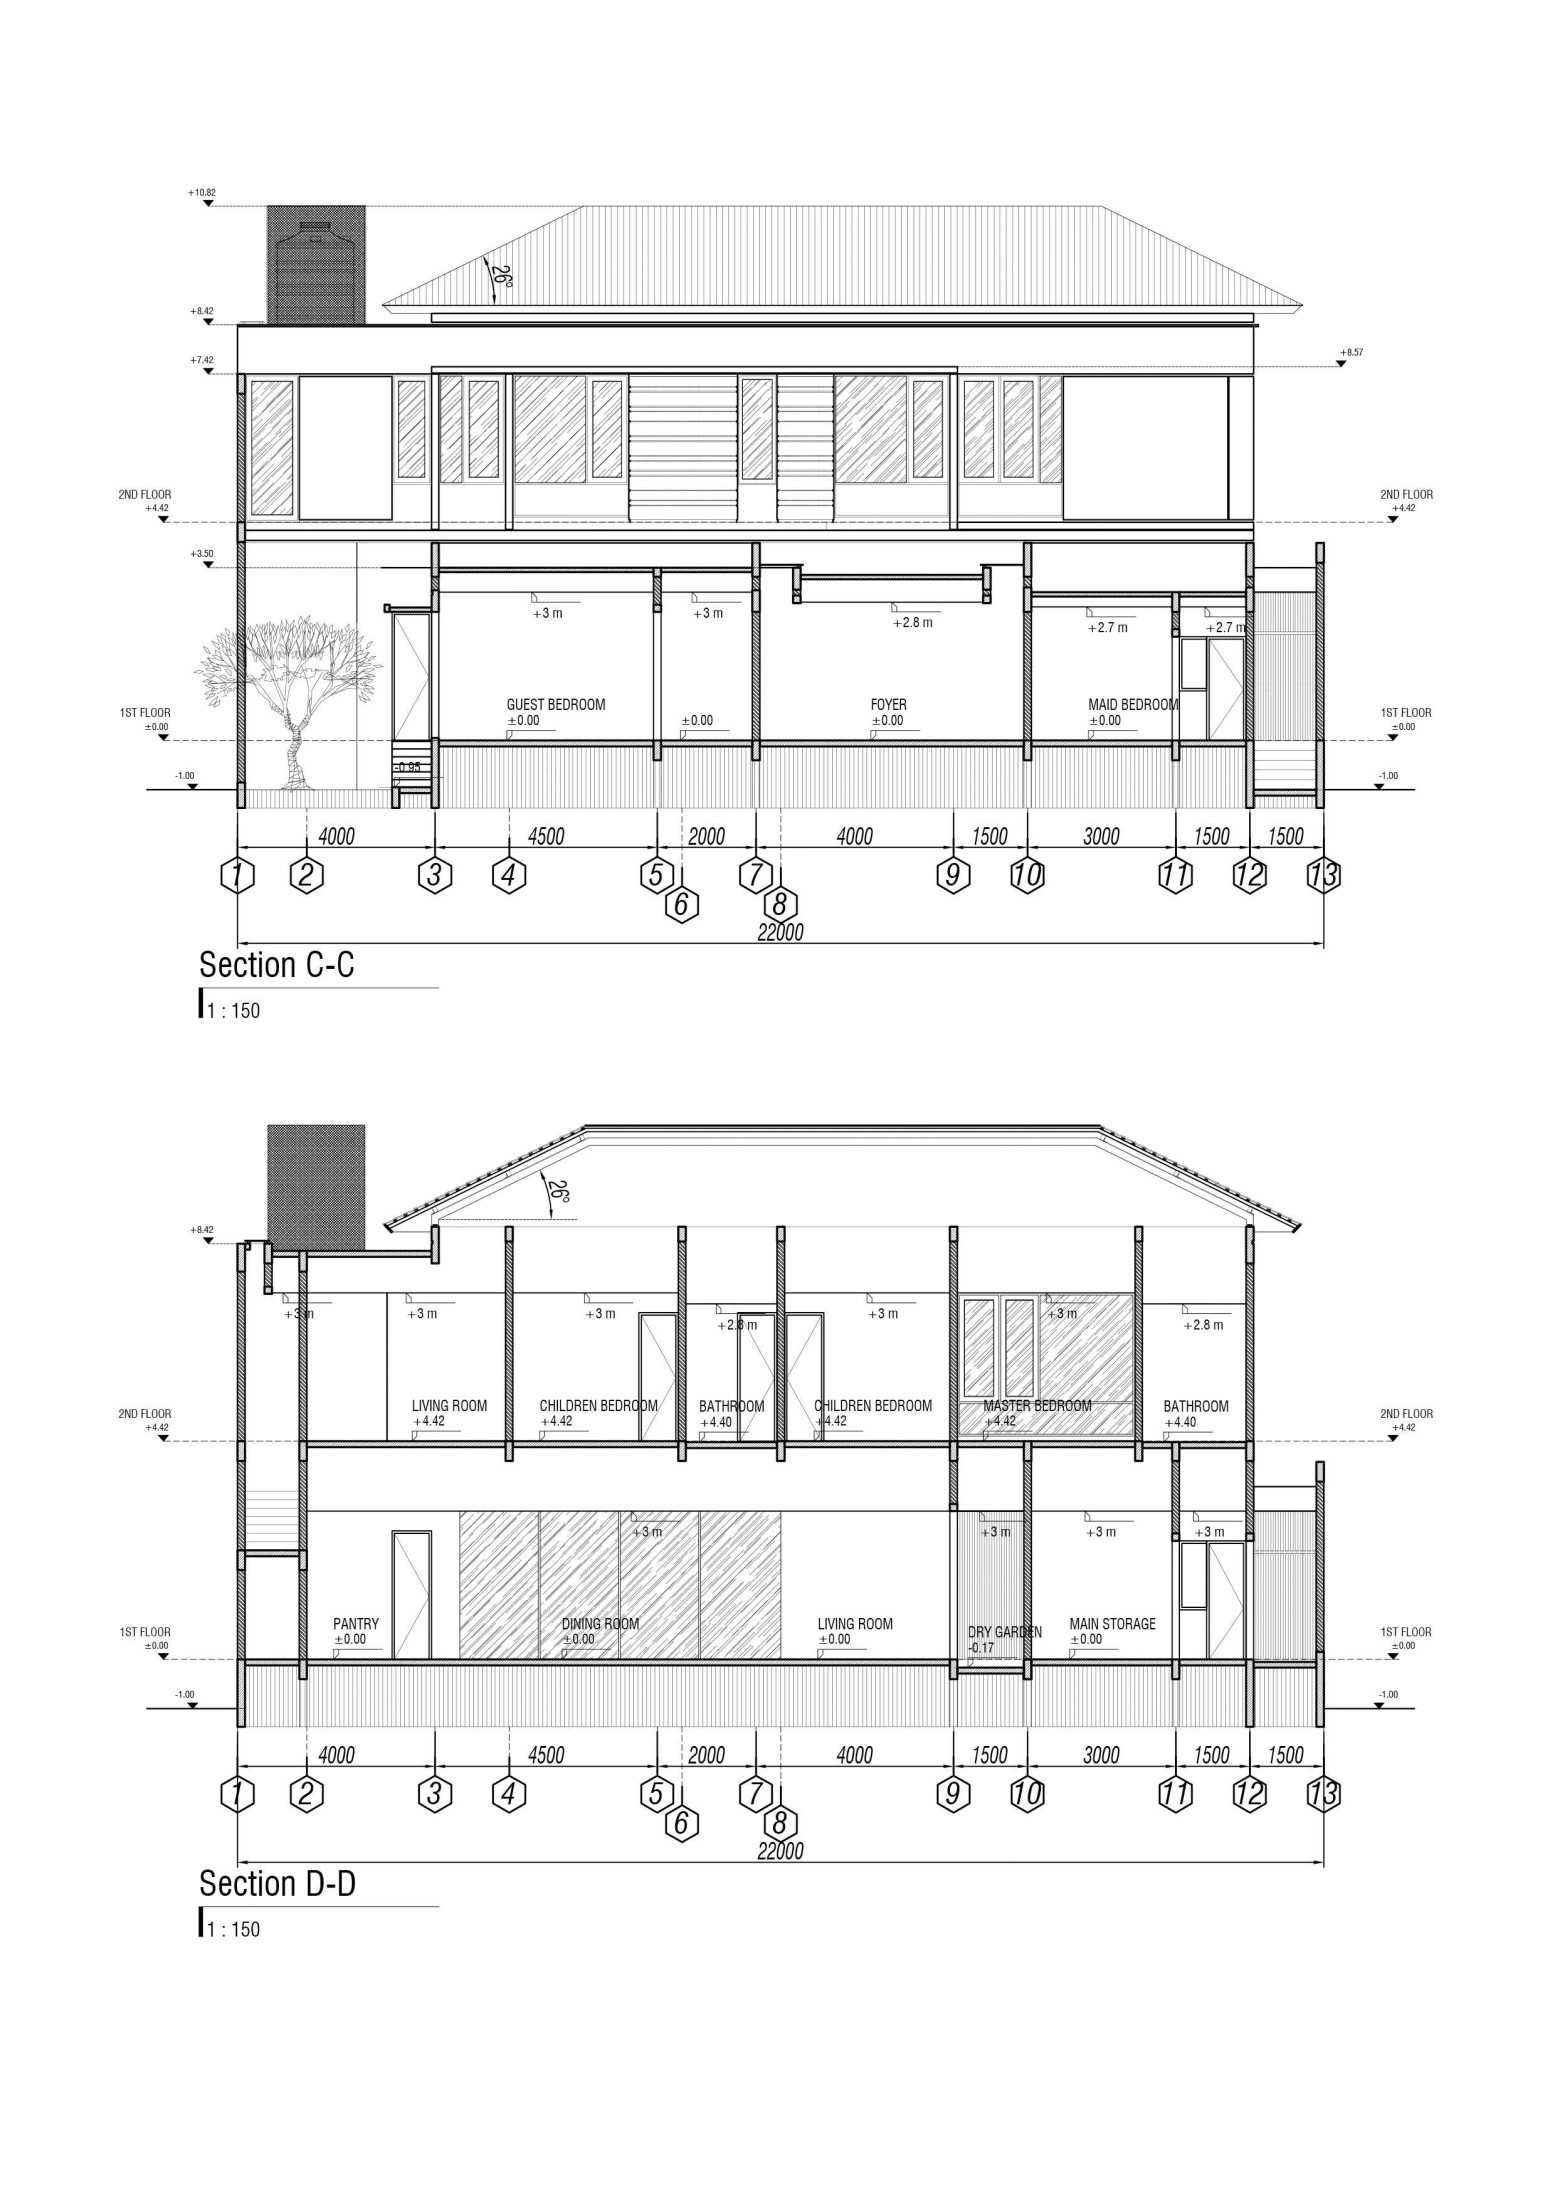 Y0 Design Architect S House Kec. Srono, Kabupaten Banyuwangi, Jawa Timur, Indonesia Kec. Srono, Kabupaten Banyuwangi, Jawa Timur, Indonesia Yohanes-Iswara-Limandjaya-S-House  121103